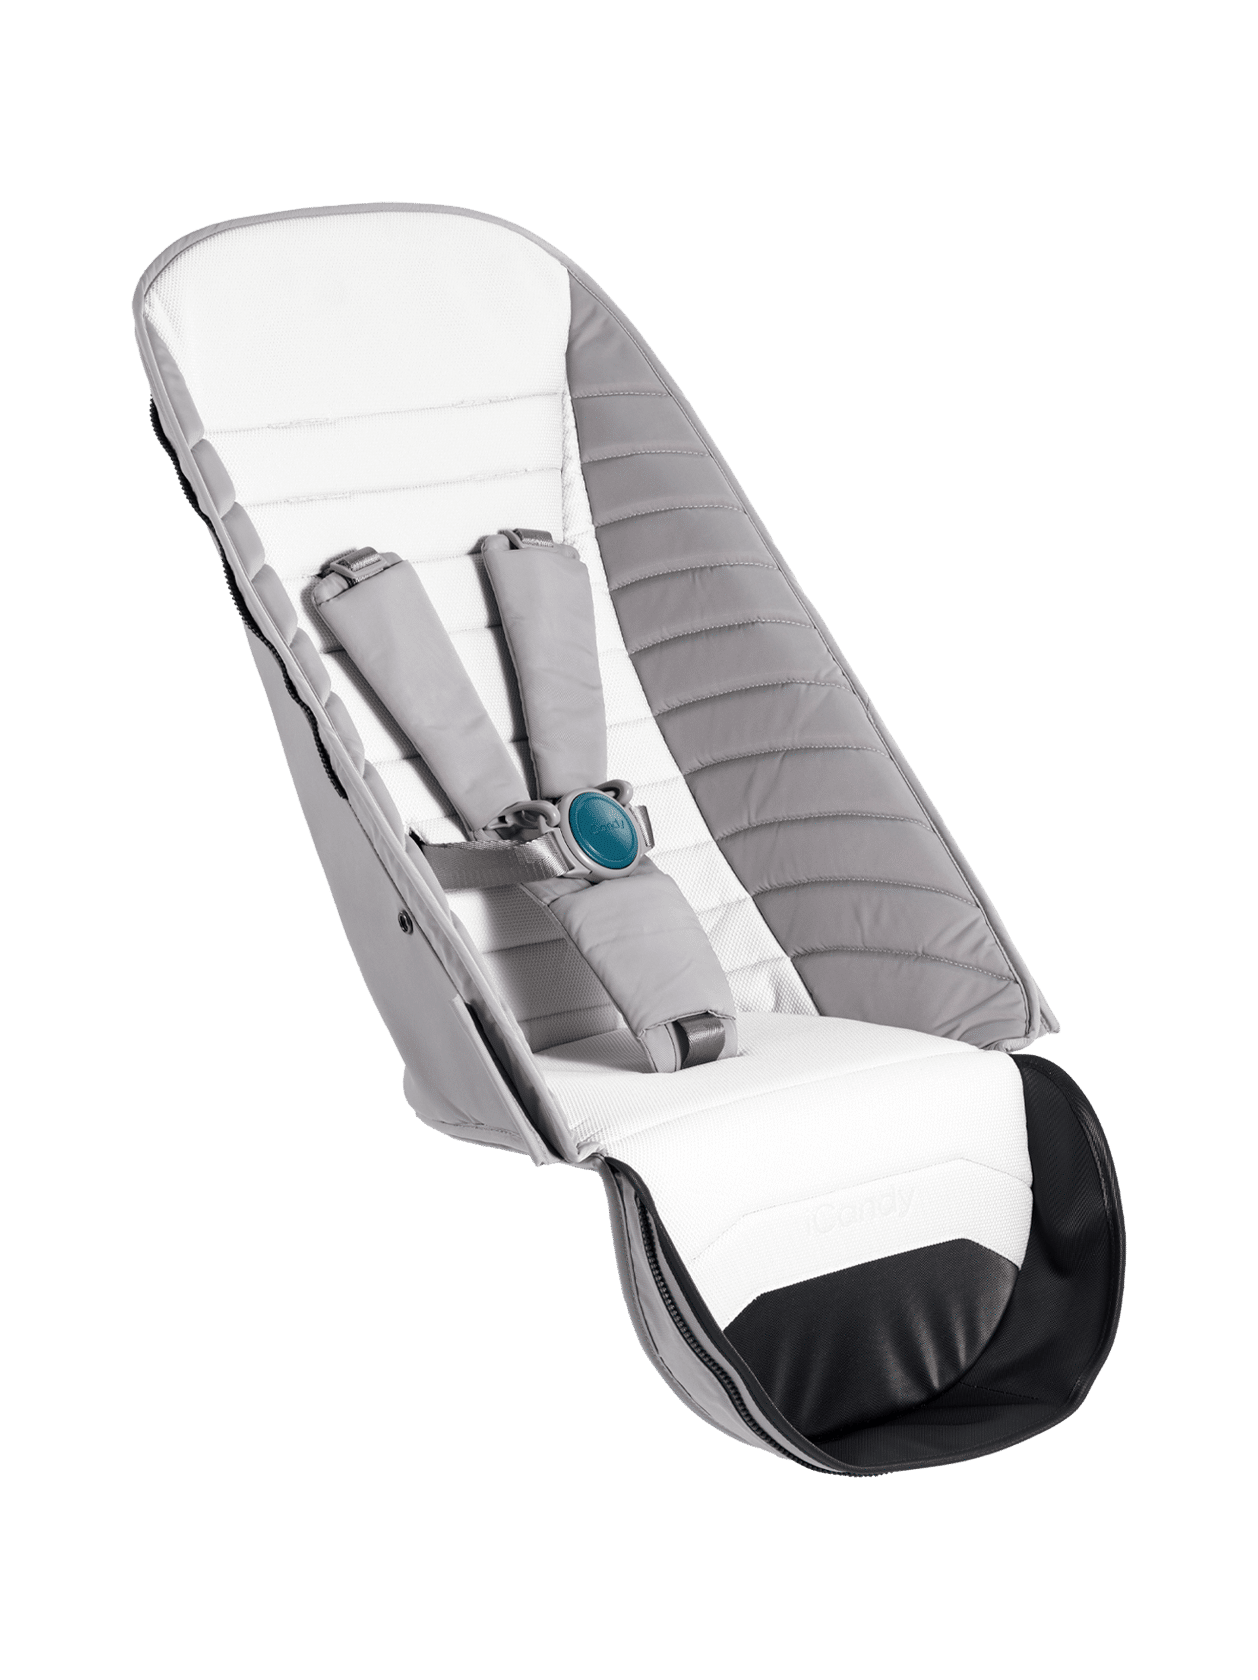 Peach 2018 Seat Unit Fabric